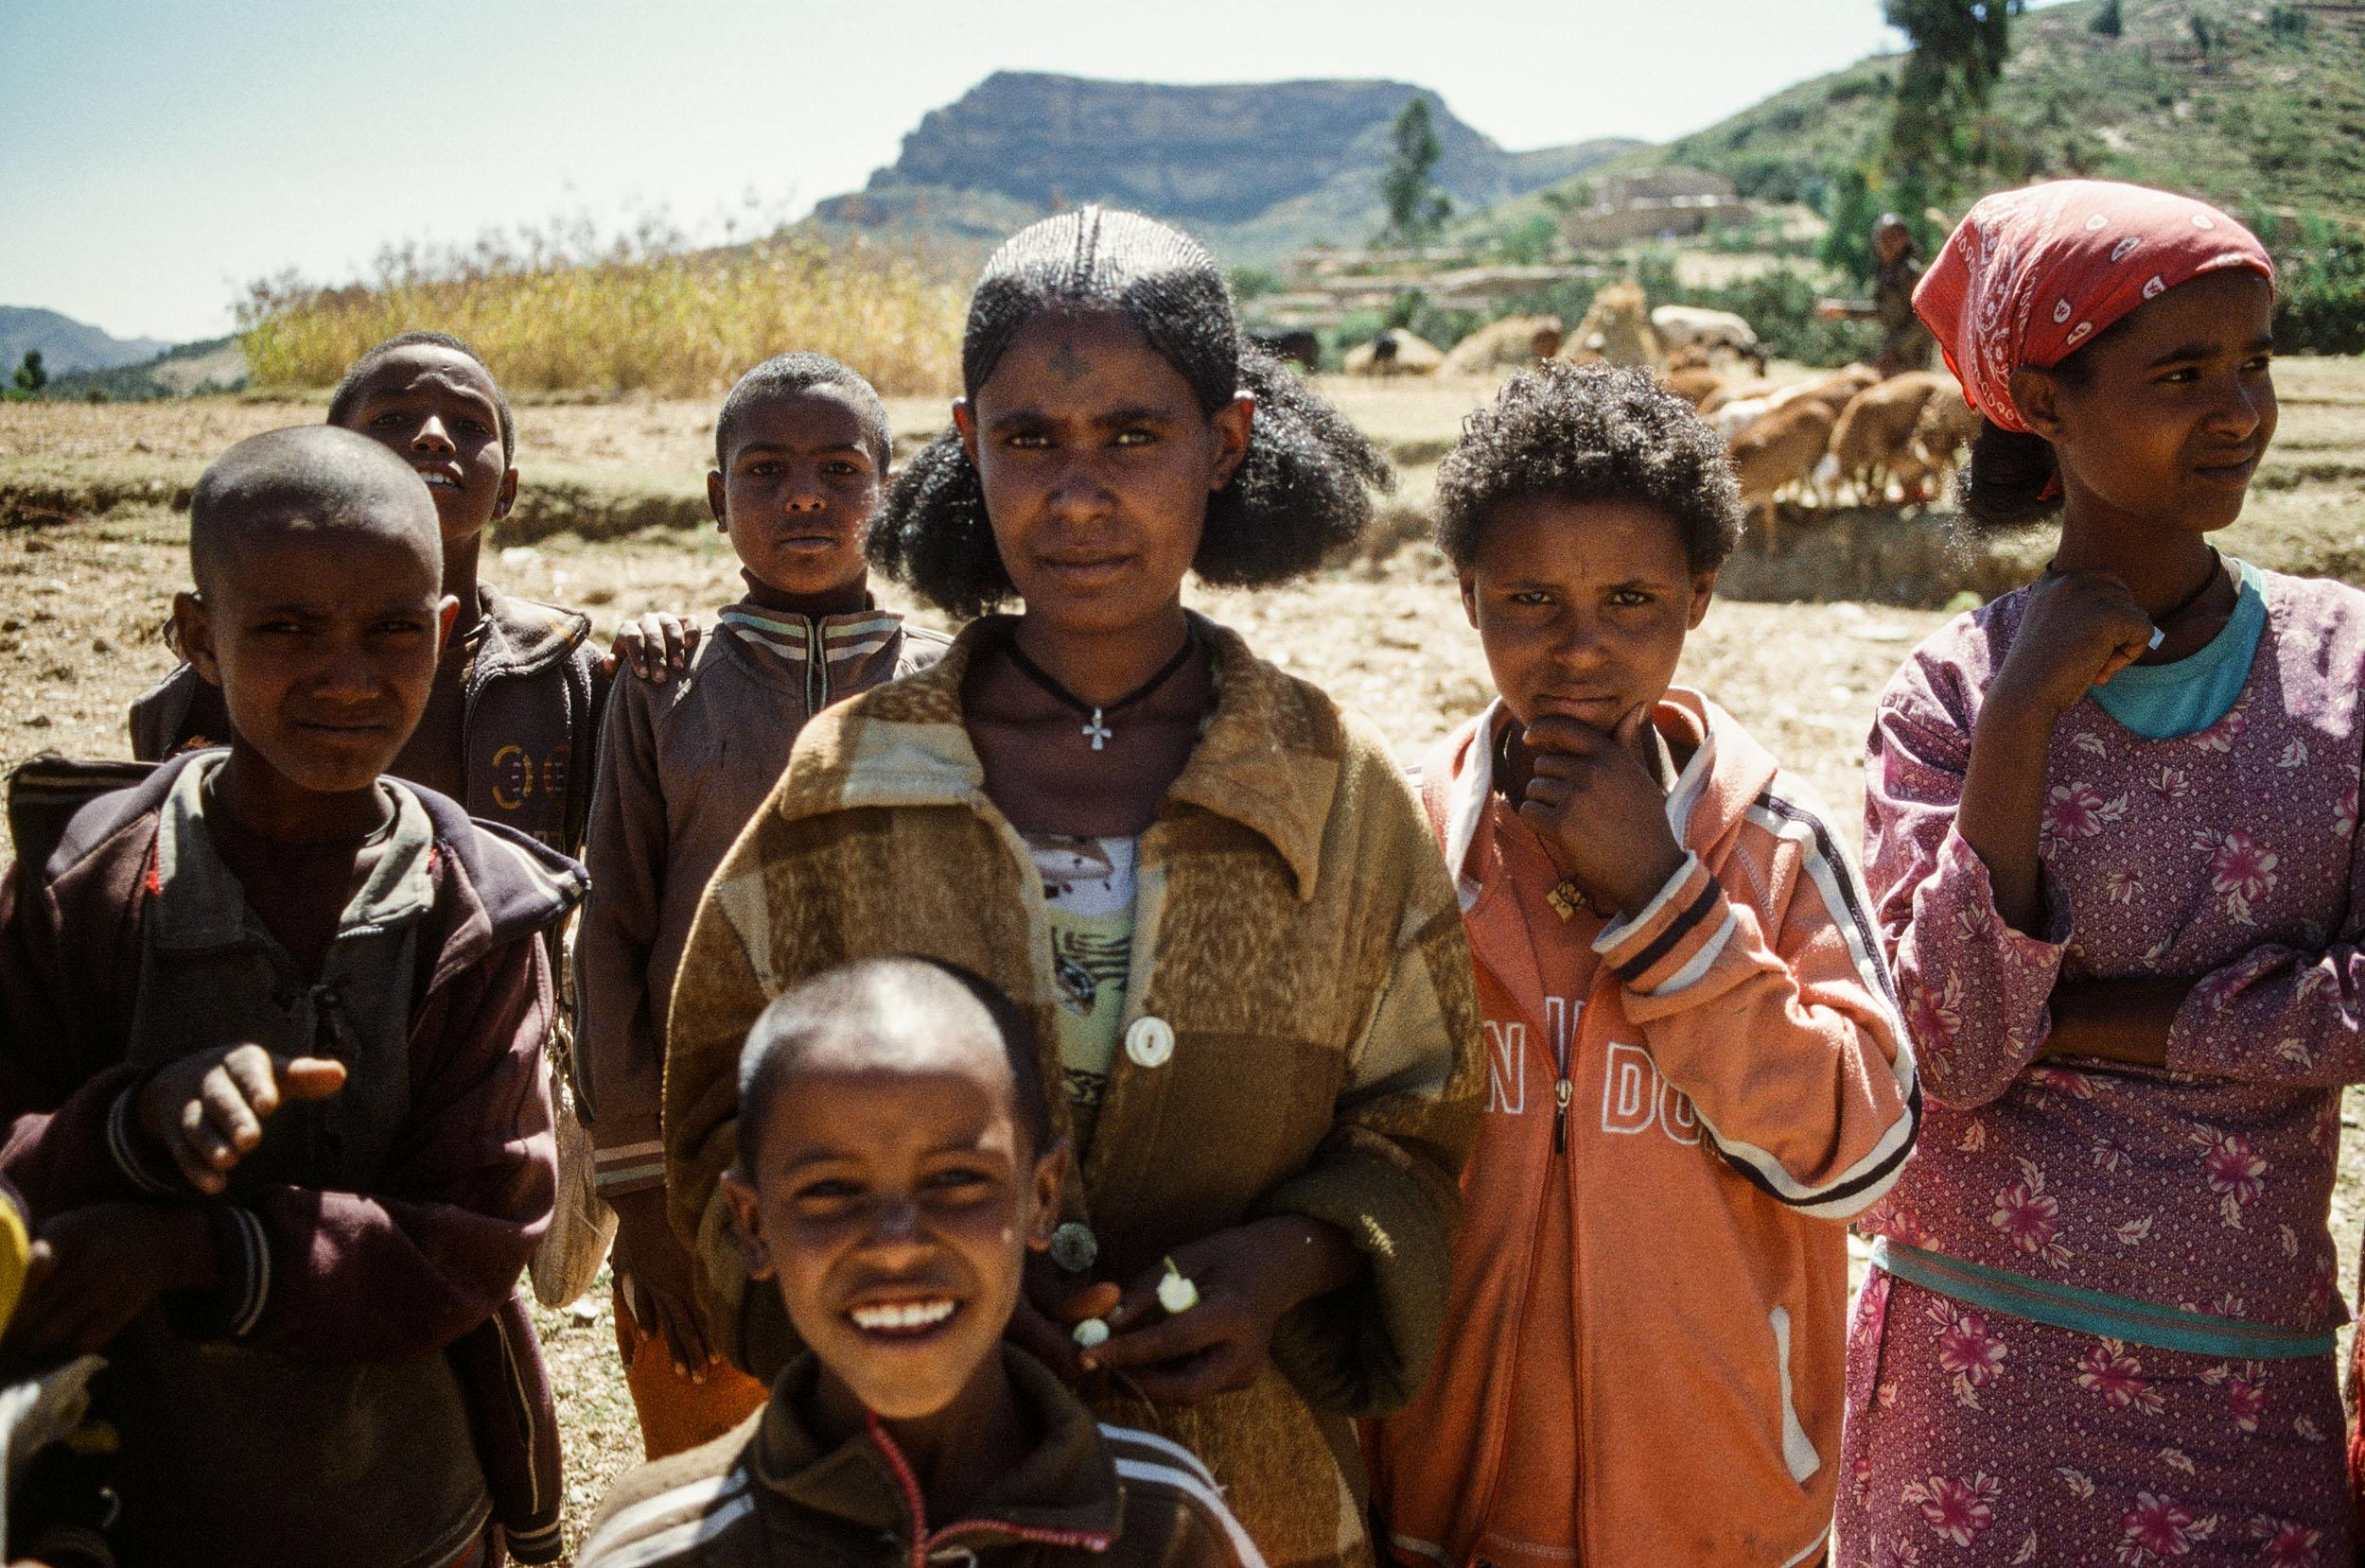 7_Ethiopia_CMPRSD_2012.jpg